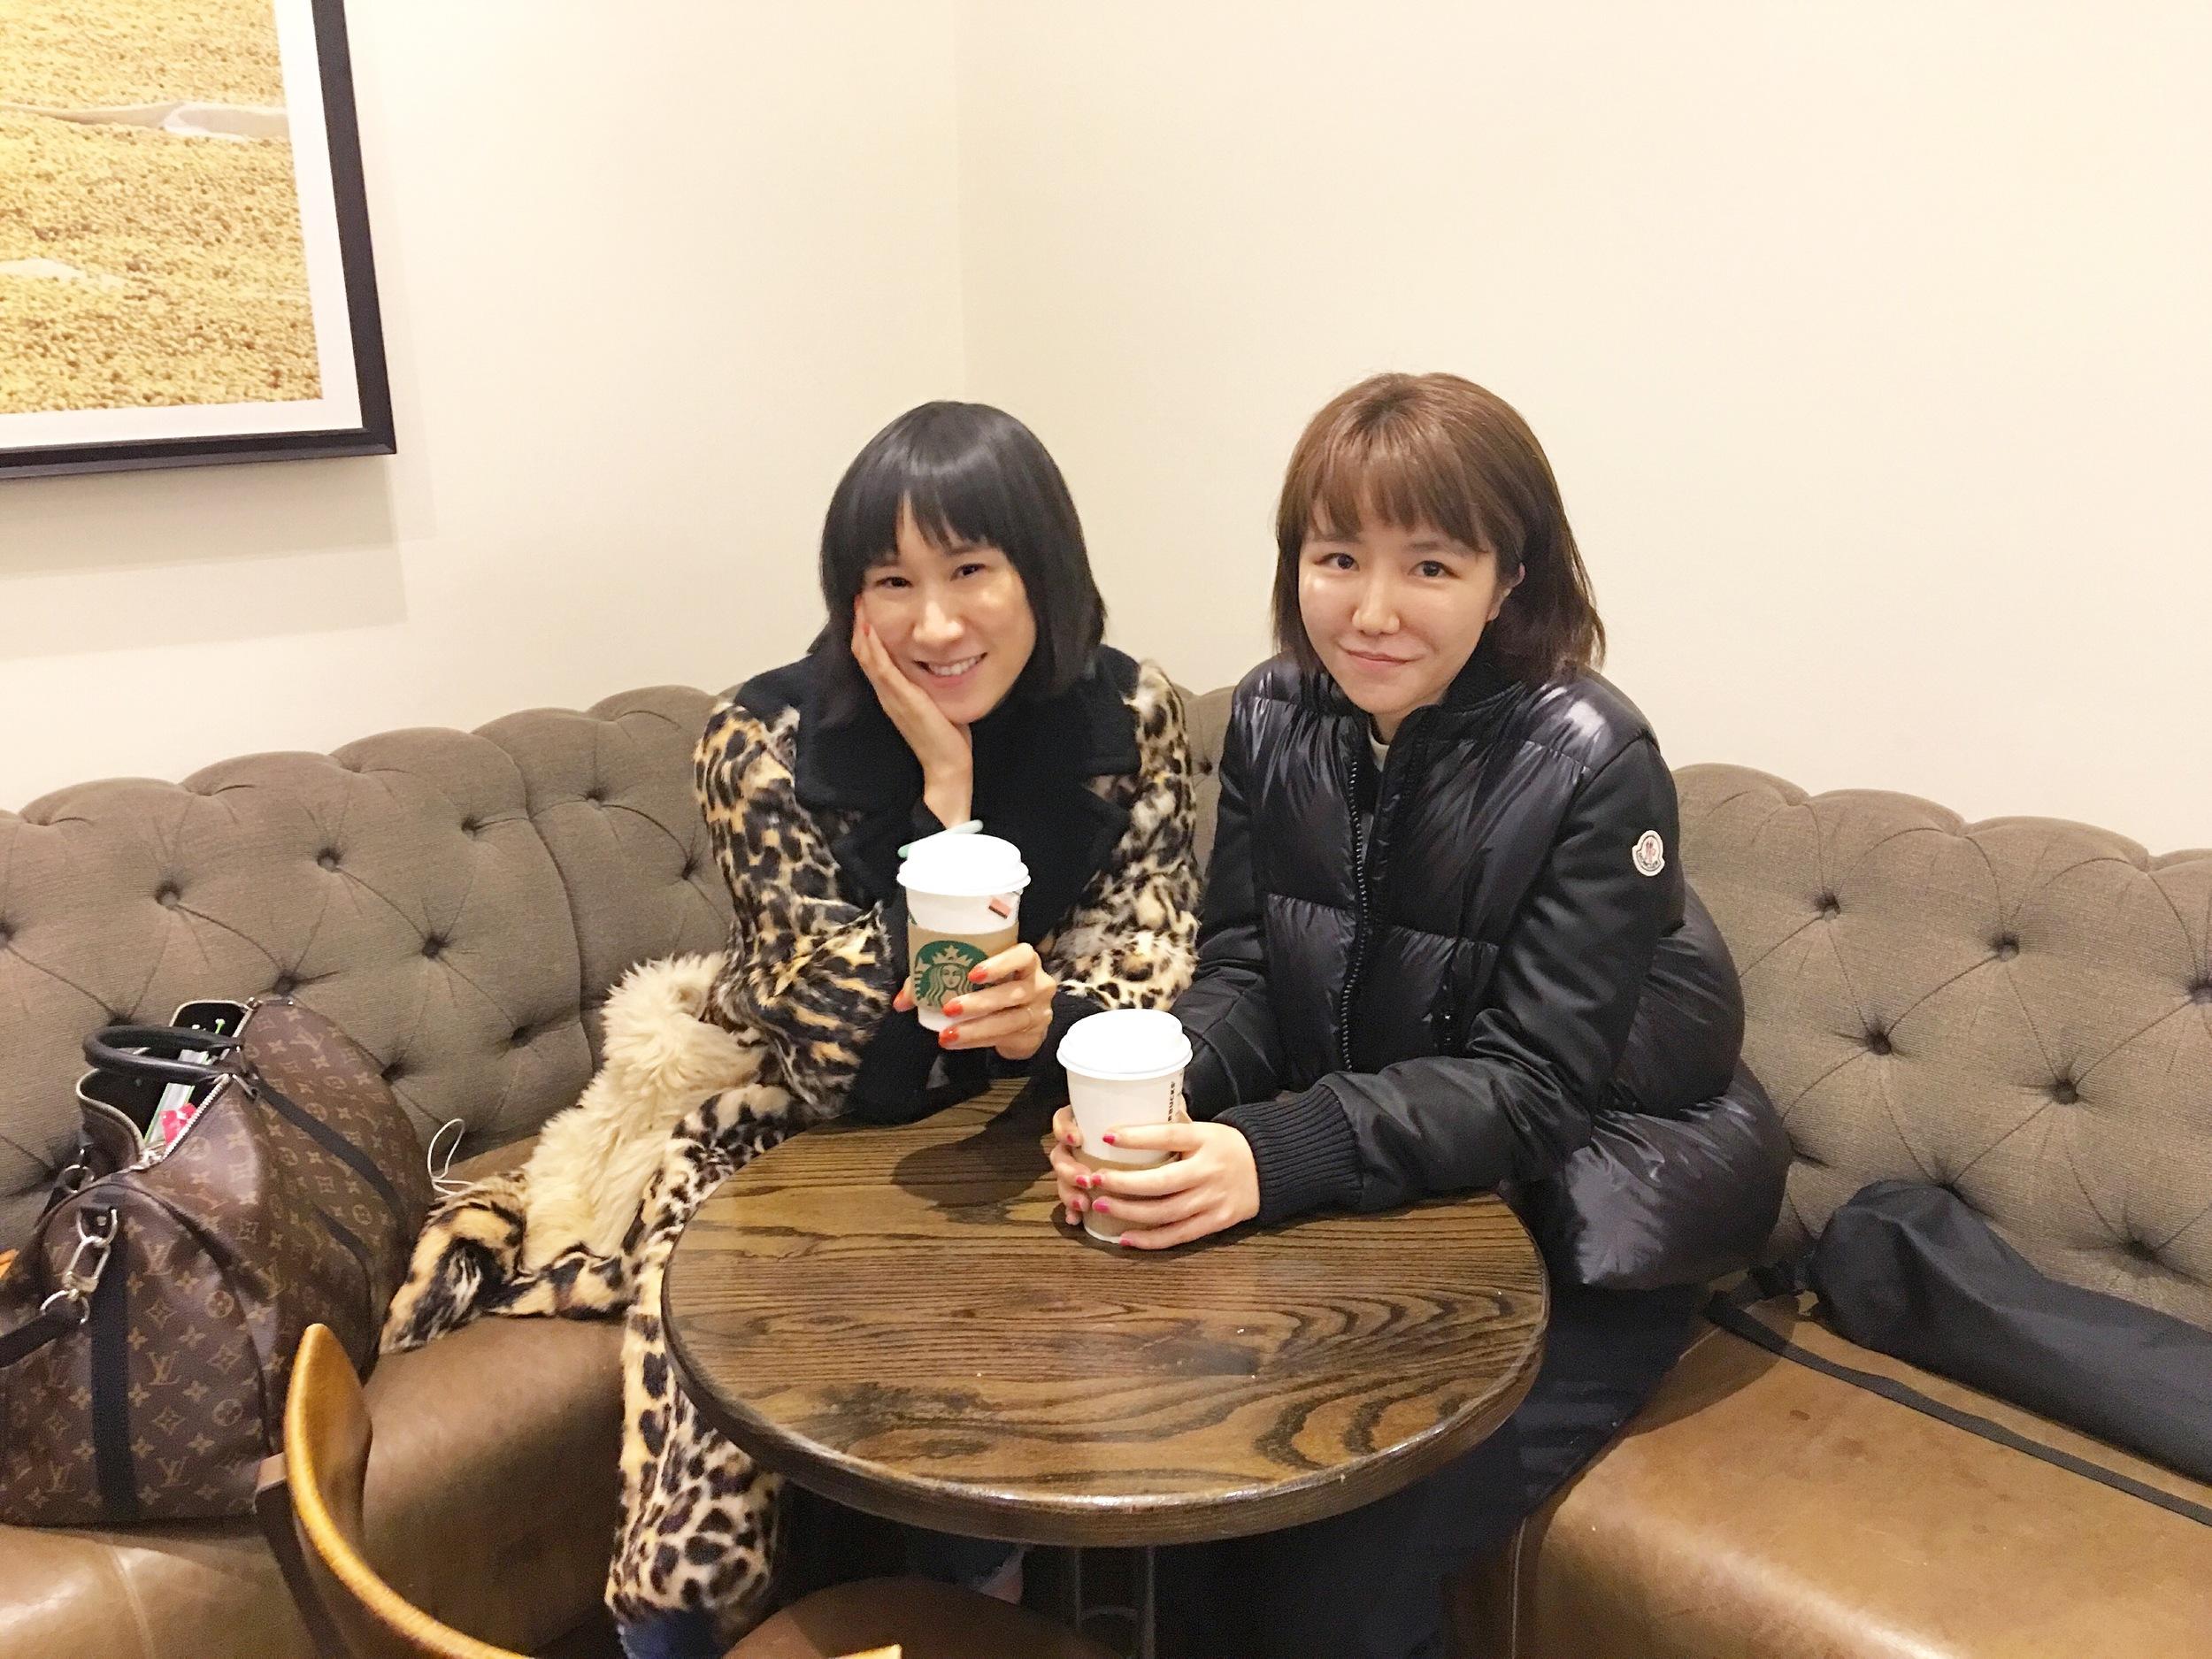 With Eva Chen